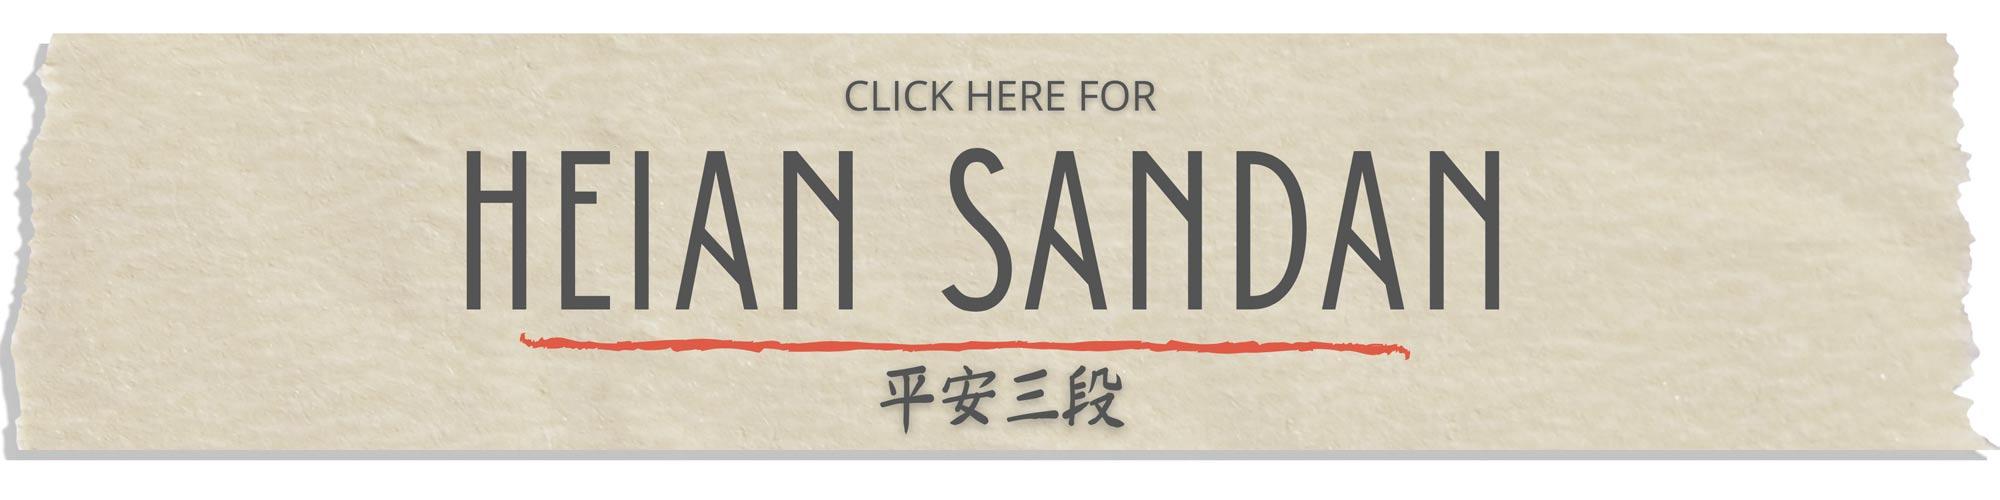 heian sandan tutorial